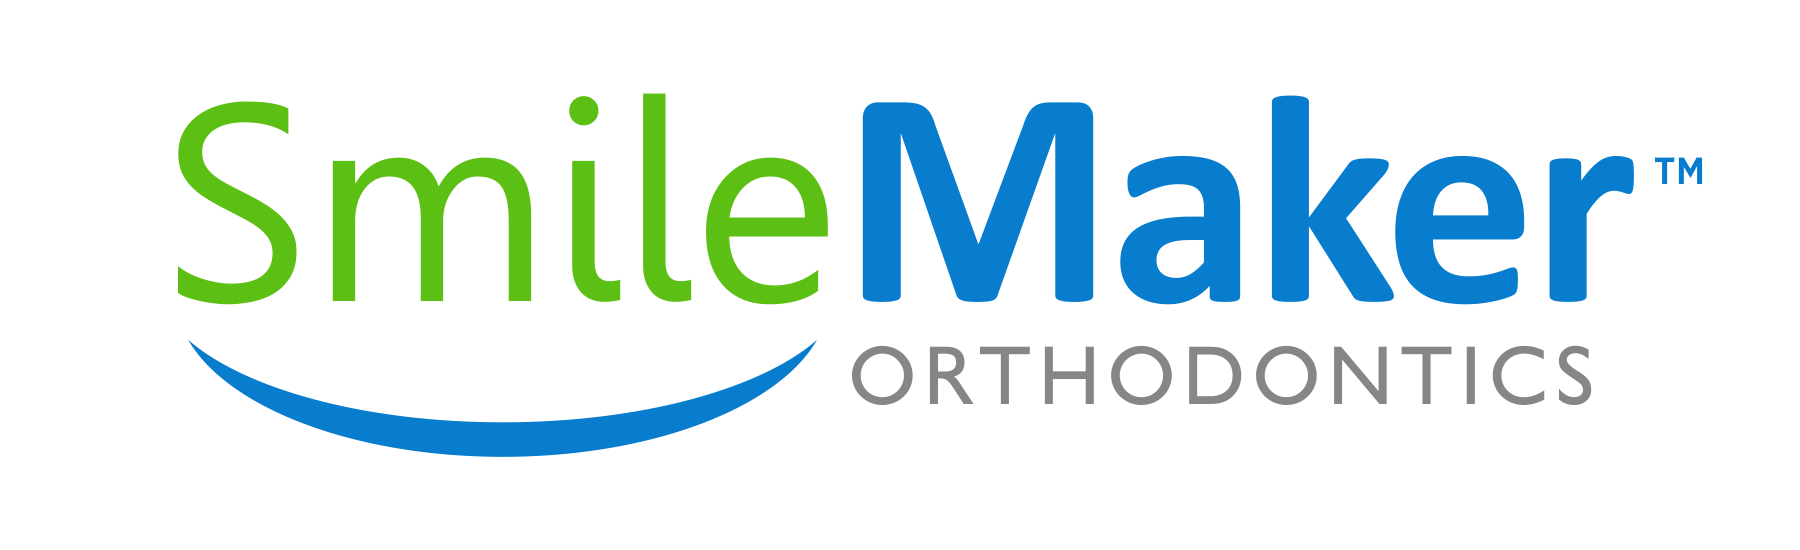 SmileMaker Orthodontics image 1